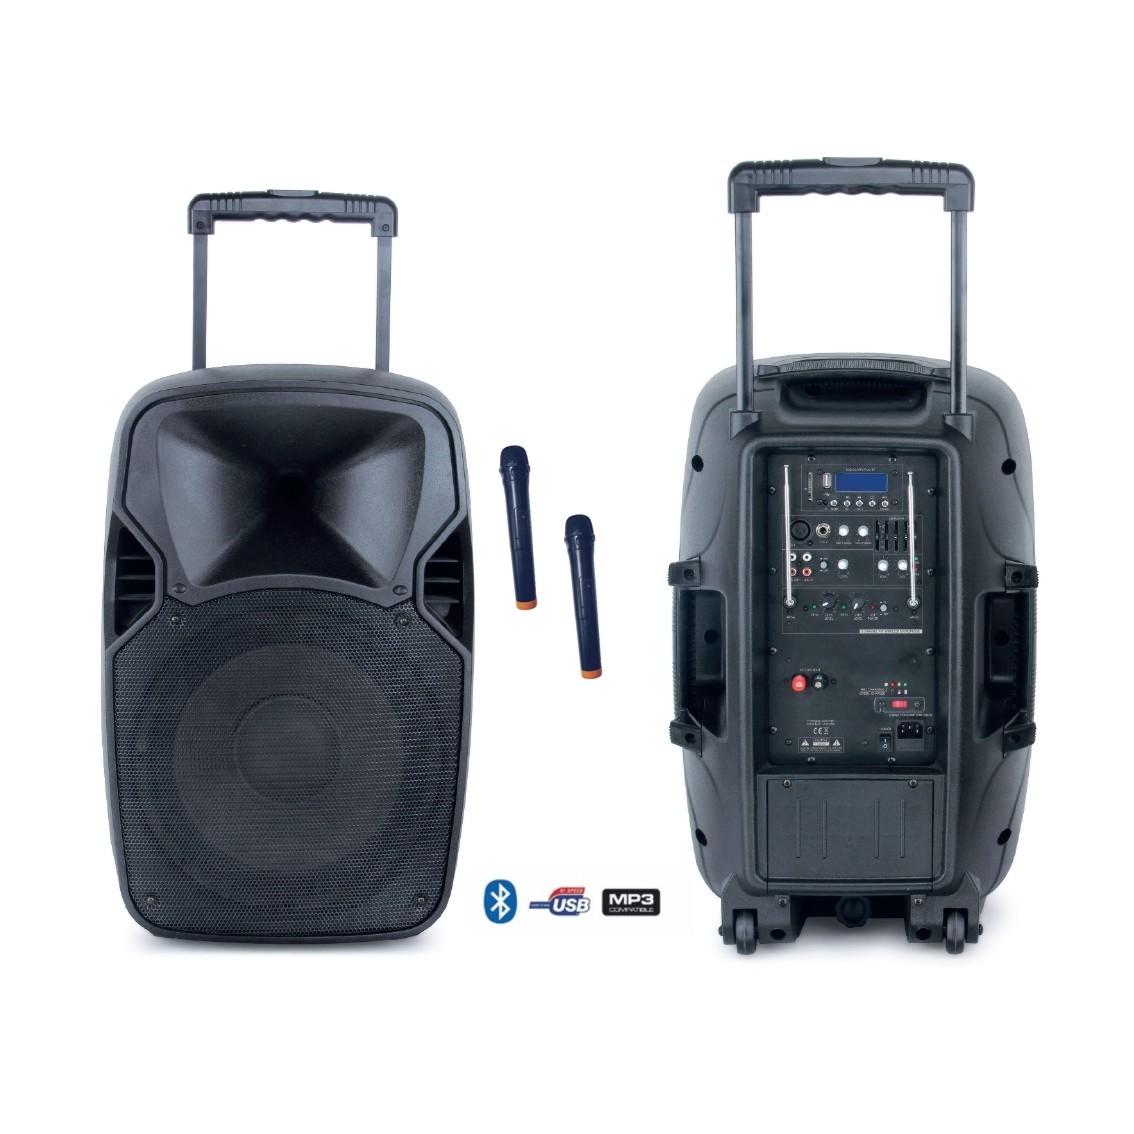 Pack sono 7 : enceinte portable autonome de 200 watts + 2micros HF